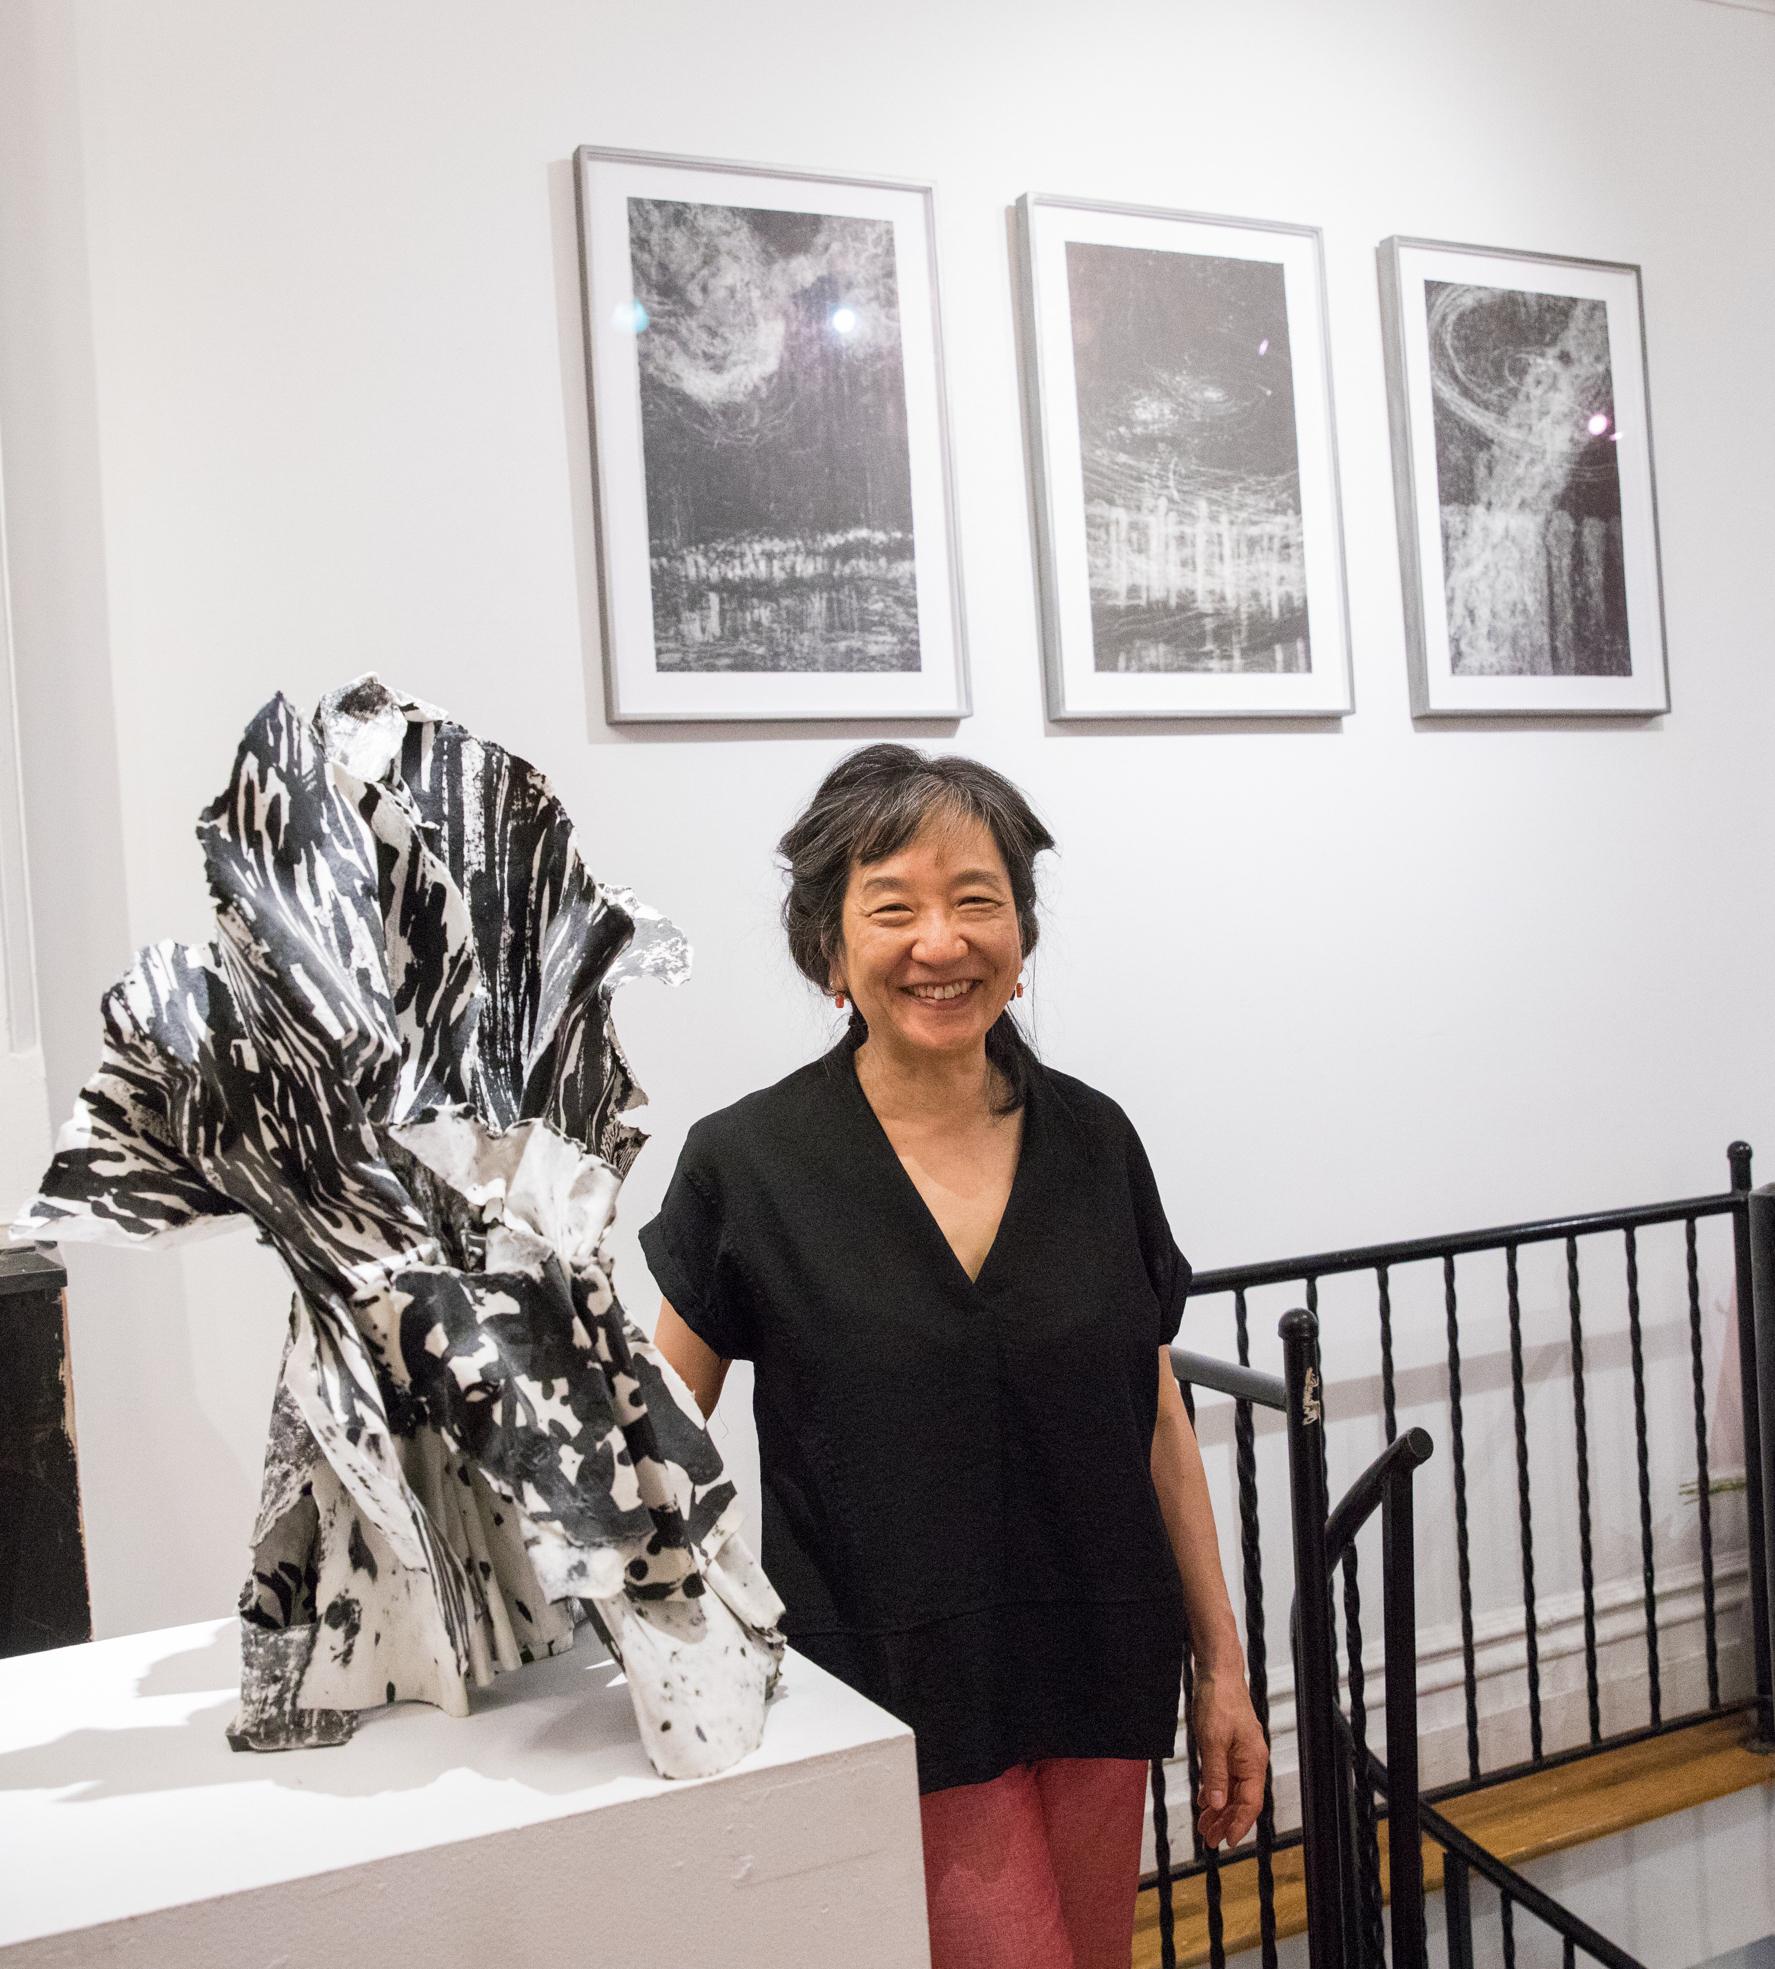 Hilda Shen portrait ©Hilda Shen, courtesy Fou Gallery 沈禾美肖像 ©沈禾美,致谢否画廊